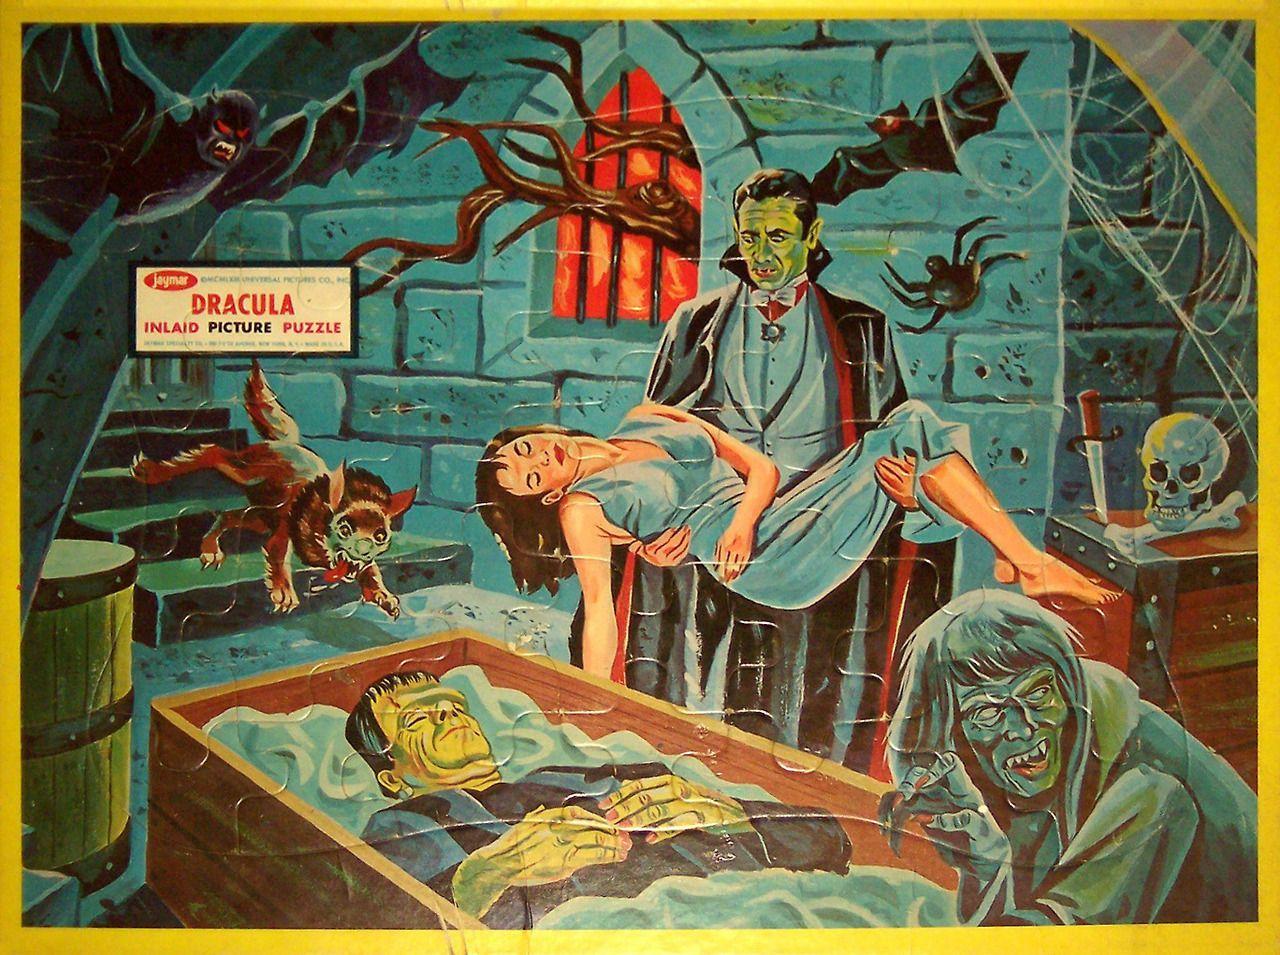 Dracula inlaid picture puzzle tumblr_mmpp7h6prx1qd9awio2